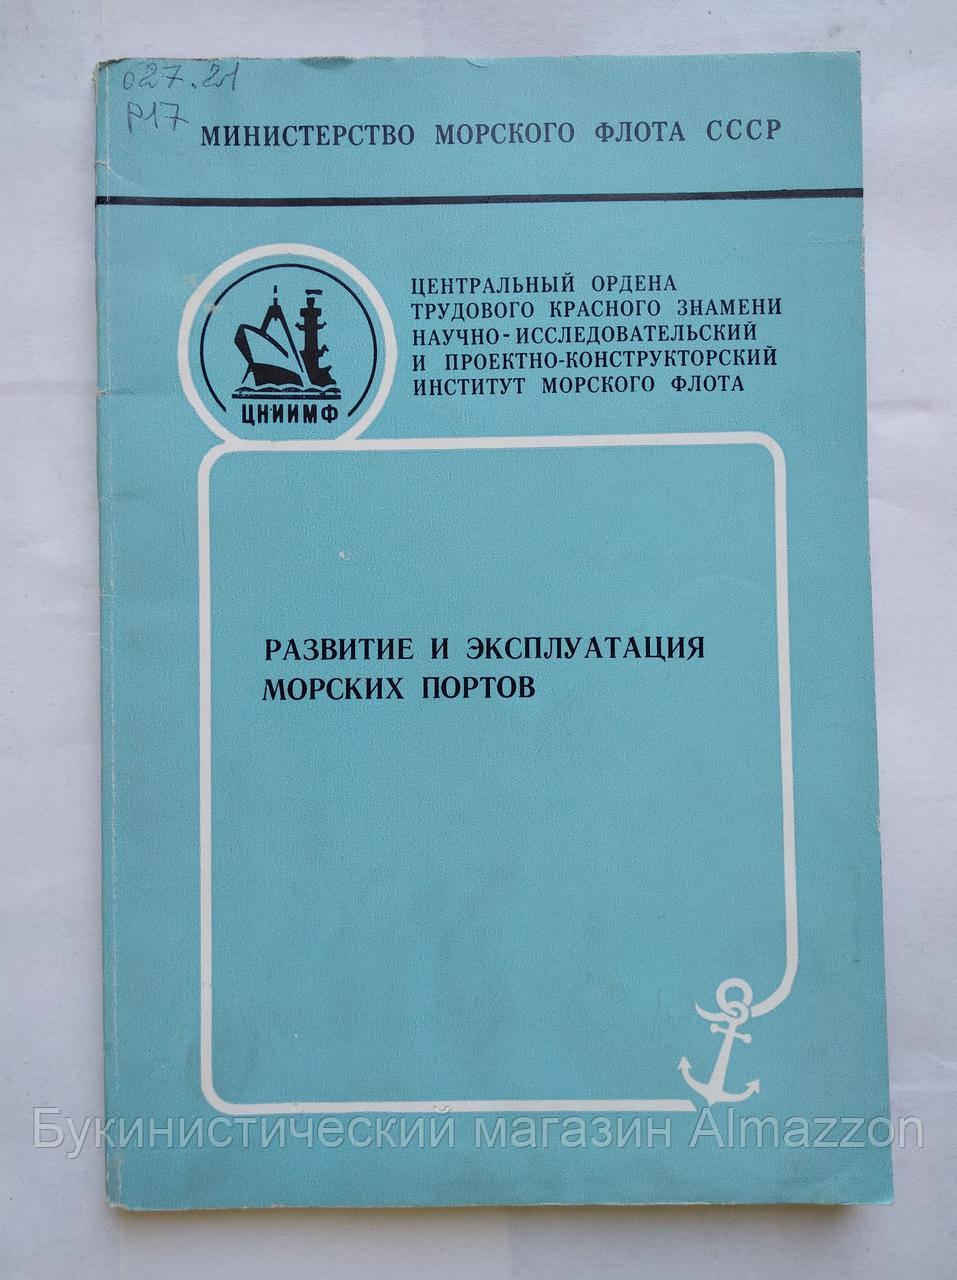 Развитие и эксплуатация морских портов